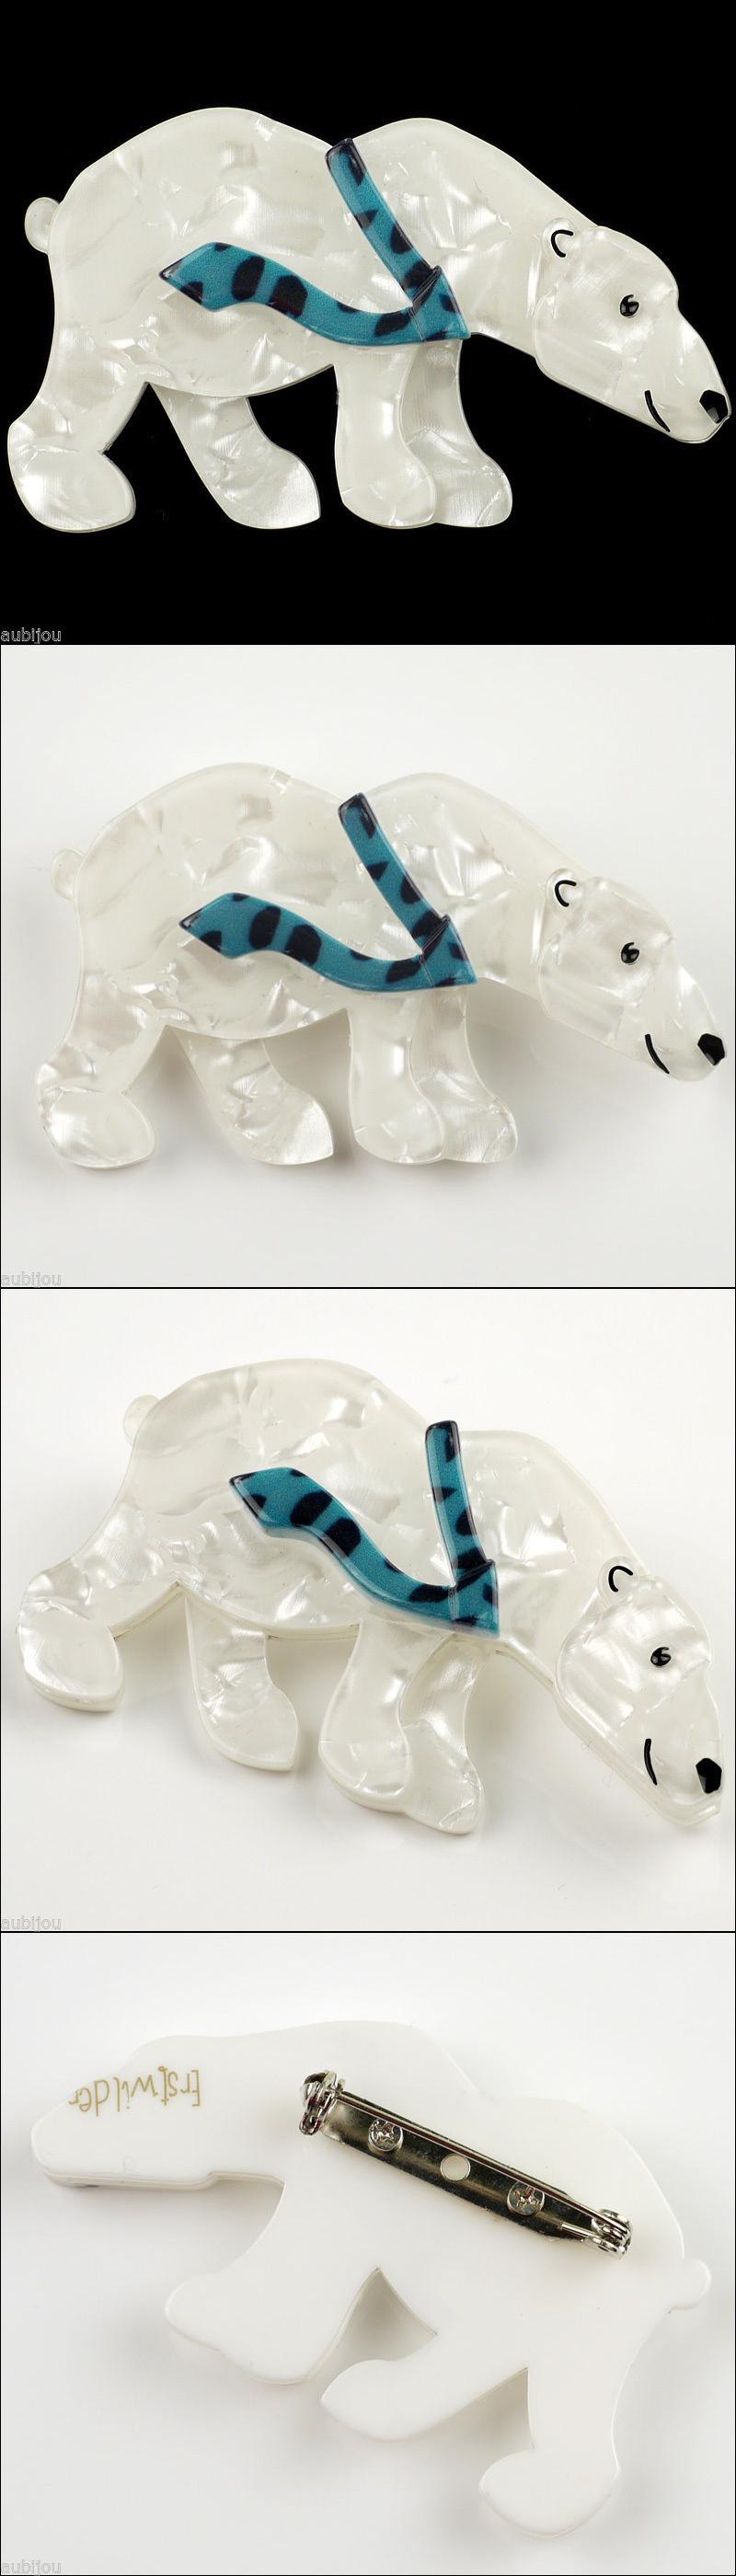 Pins and Brooches 50677: Erstwilder Pav The Polar Bear Resin Brooch Pin Nib -> BUY IT NOW ONLY: $35 on eBay!